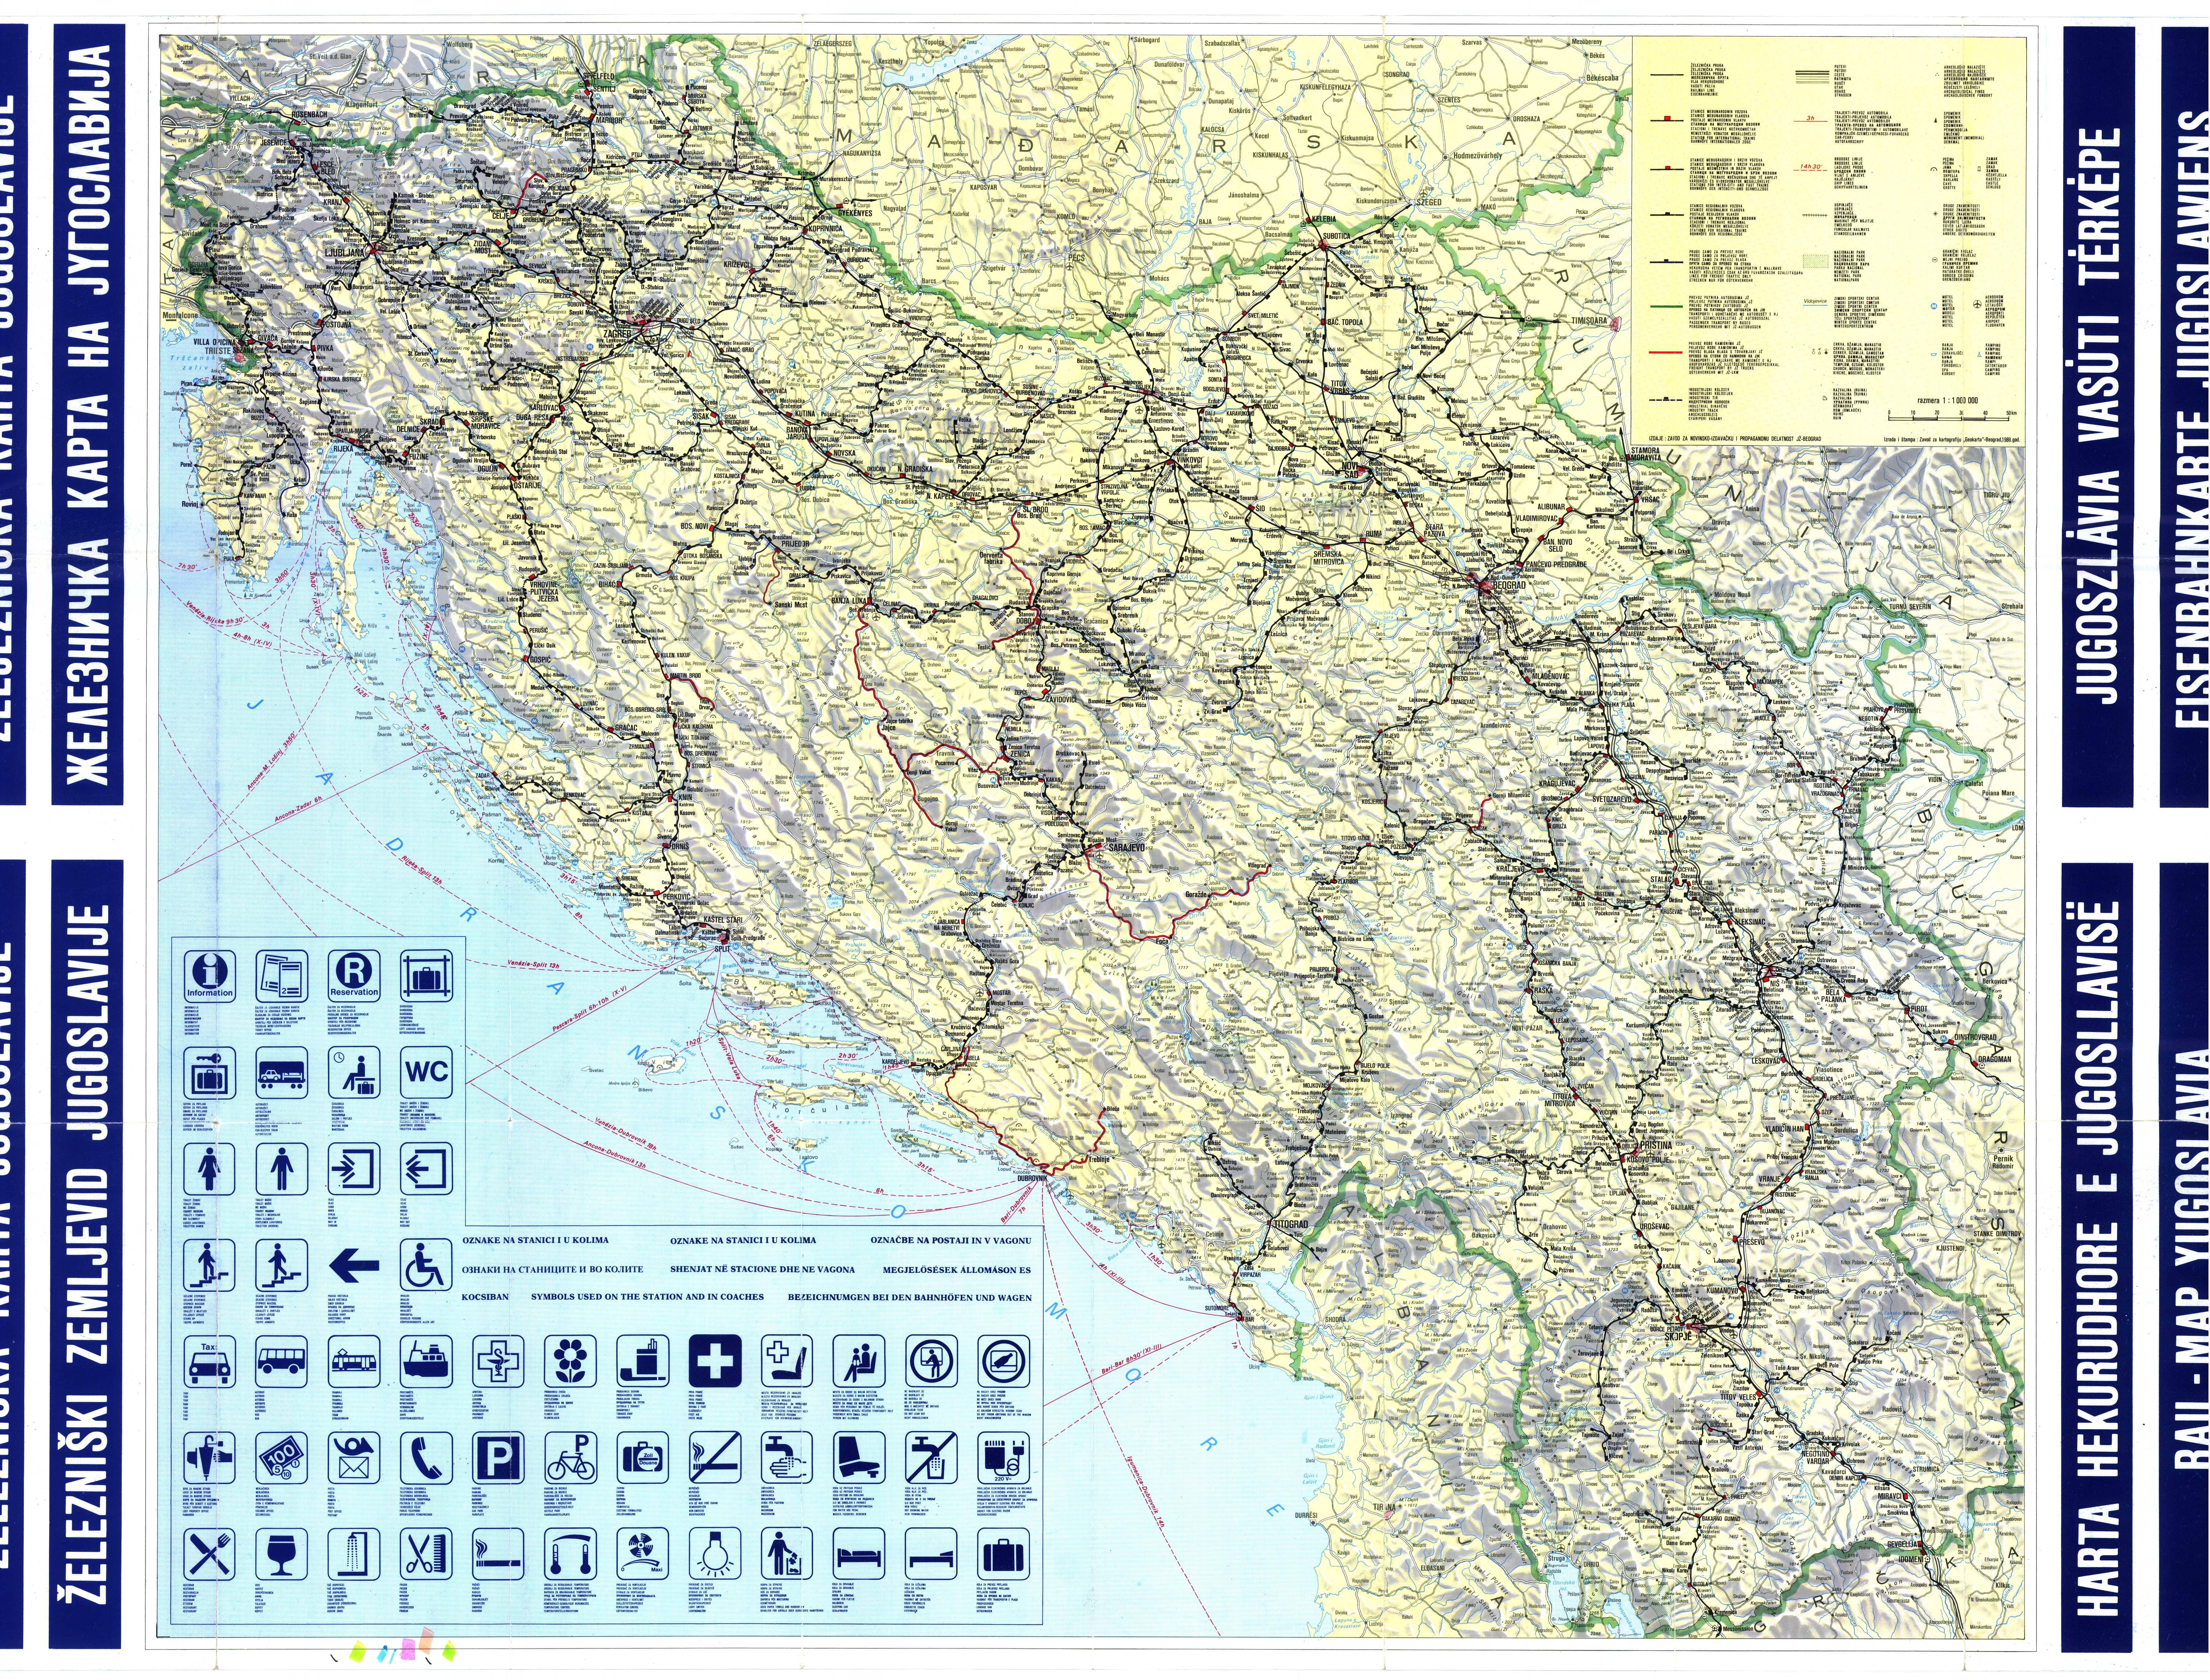 Pin Stara Crna Gora Images To Pinterest